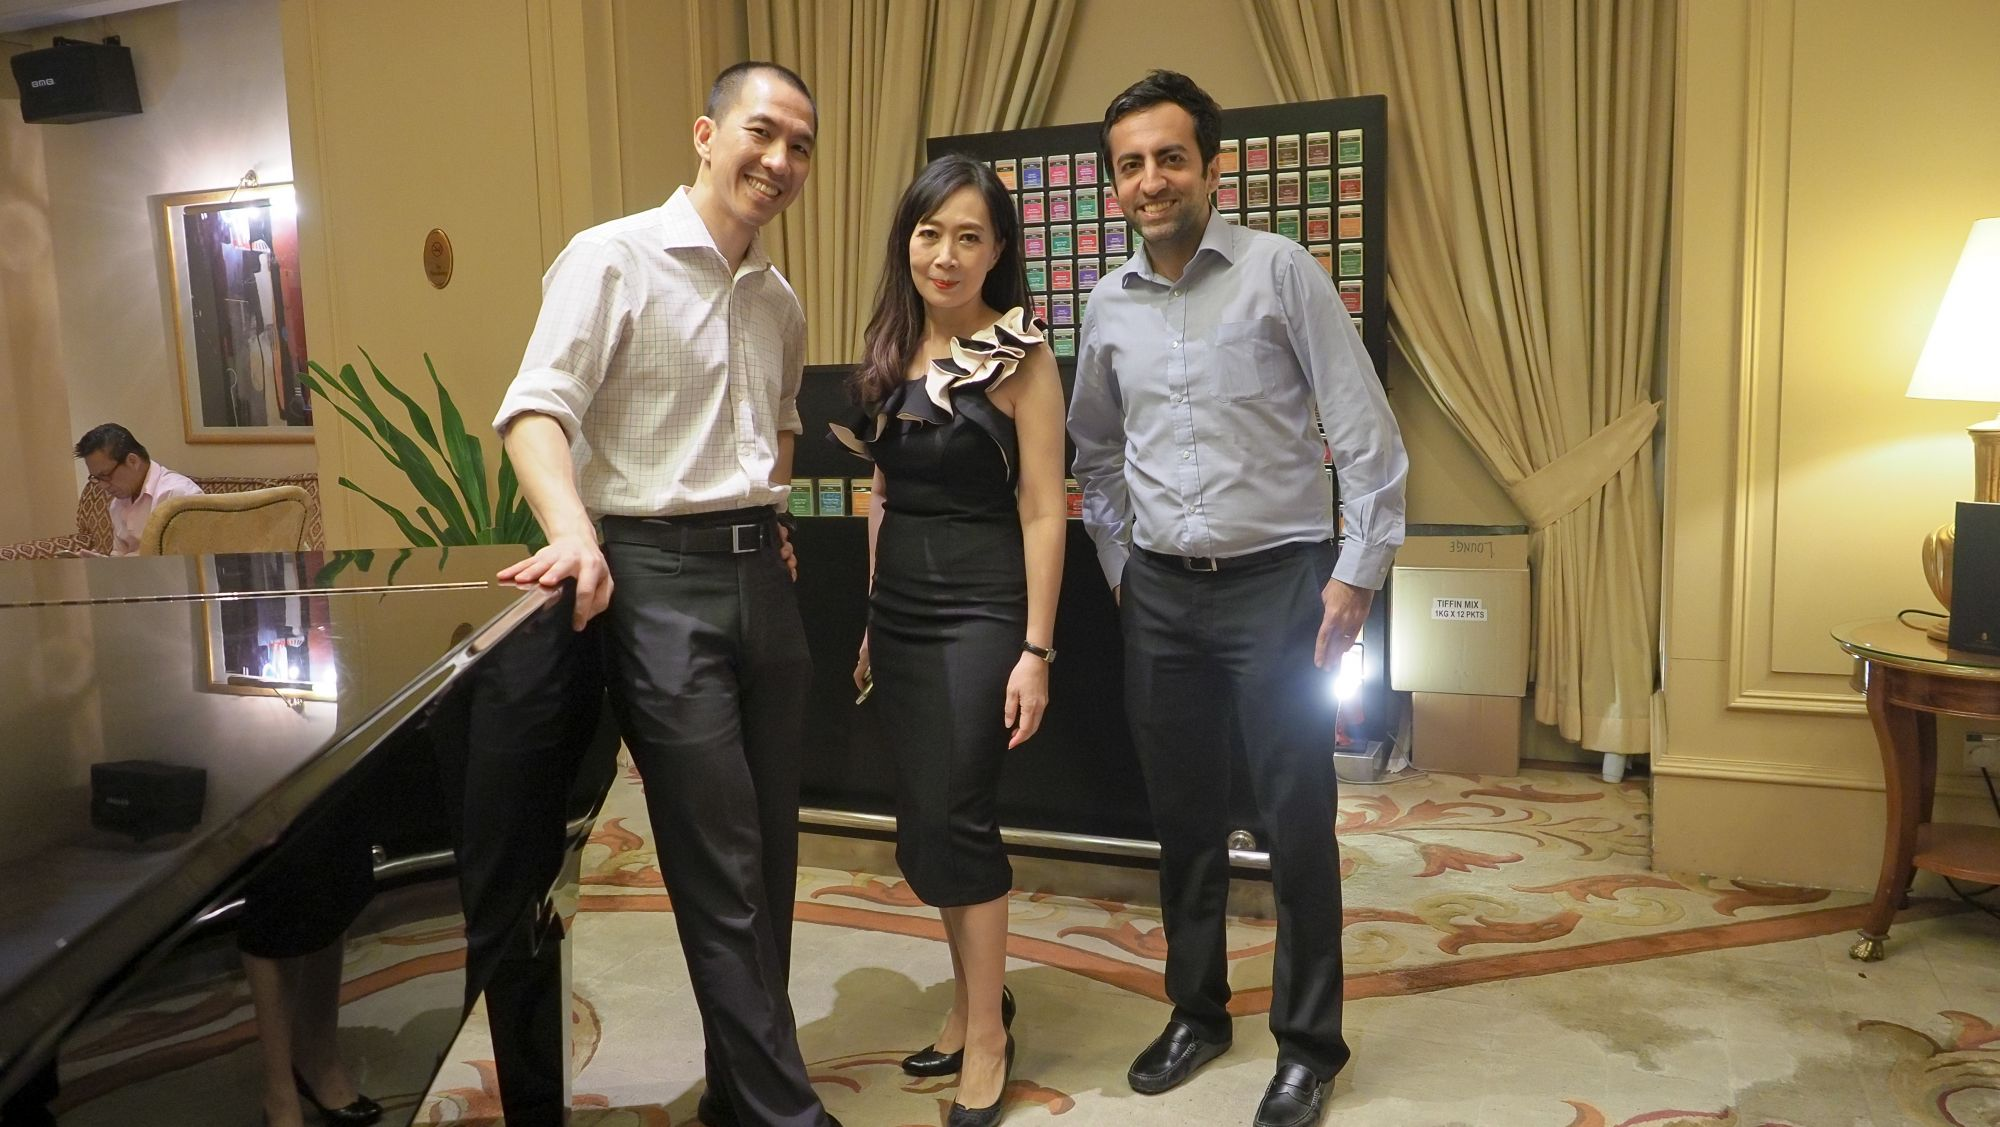 Lien Choong Luen, Irene SM Lee, Rahul Daswani